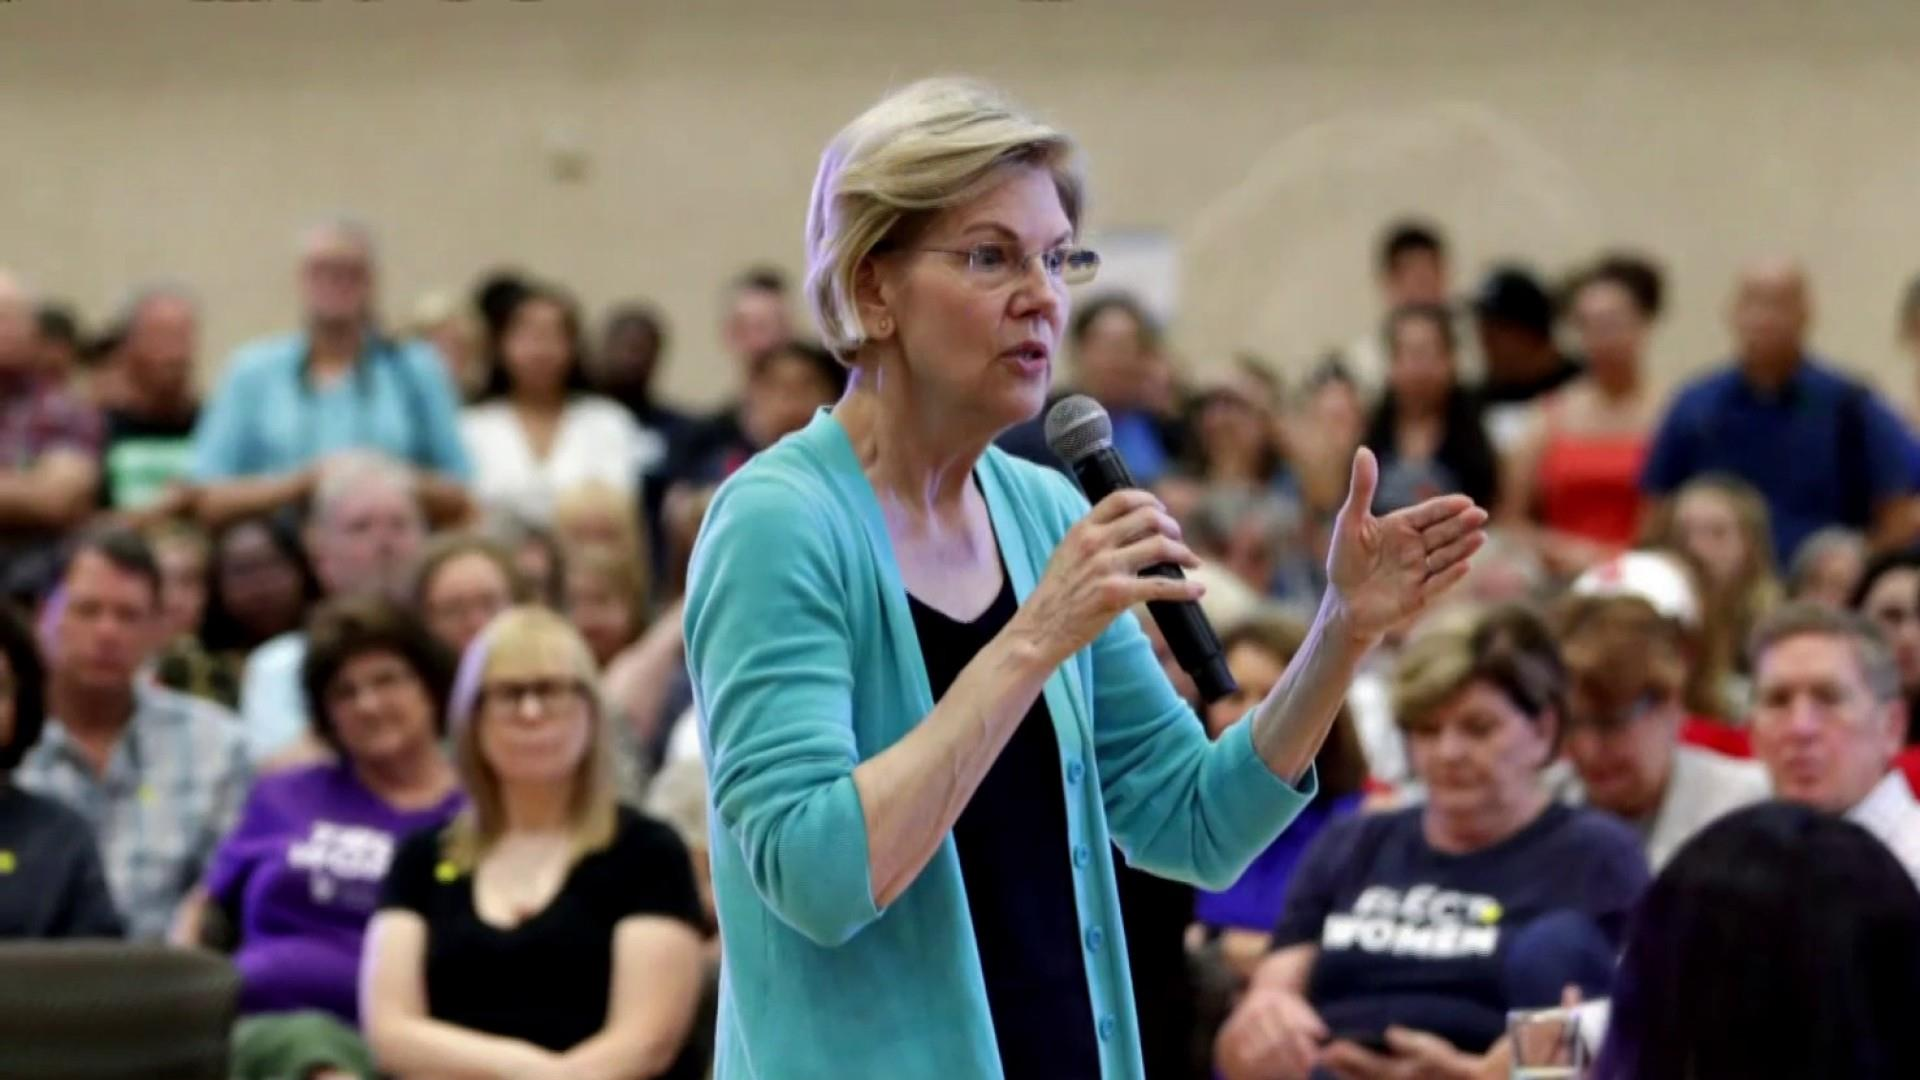 Warren announces major fundraising milestone days before debate